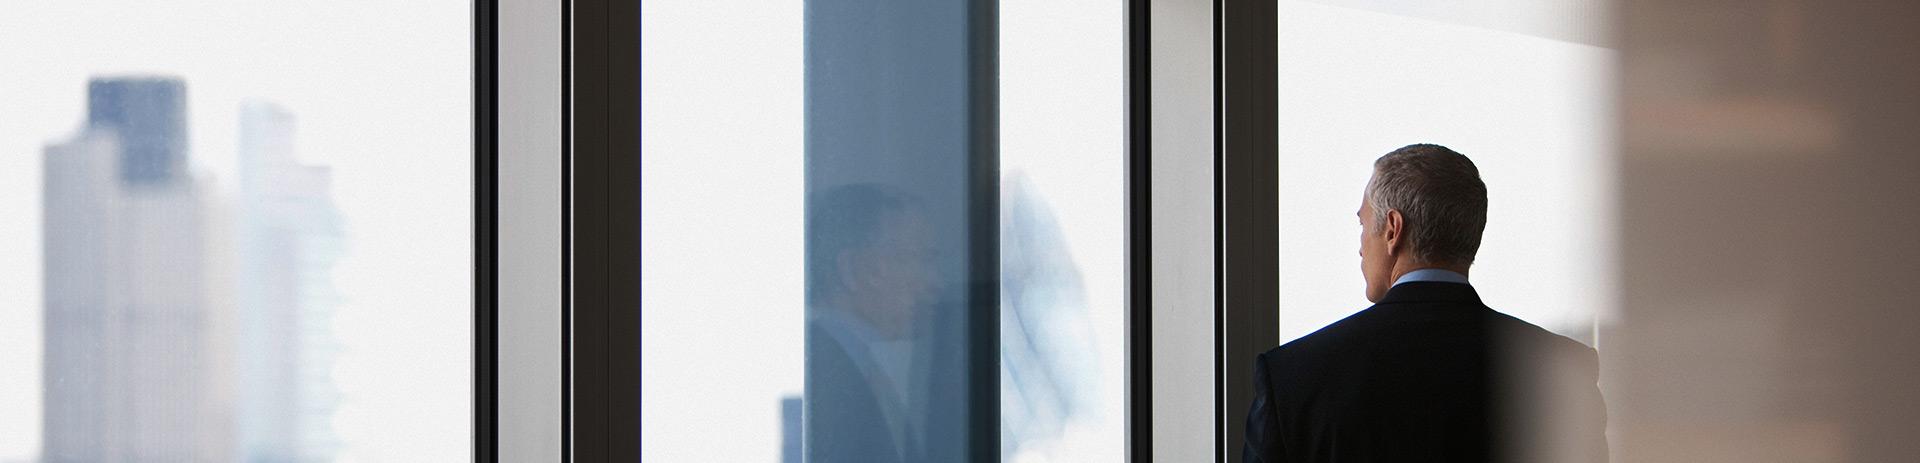 älterer Mann mit Blick aus Fenster